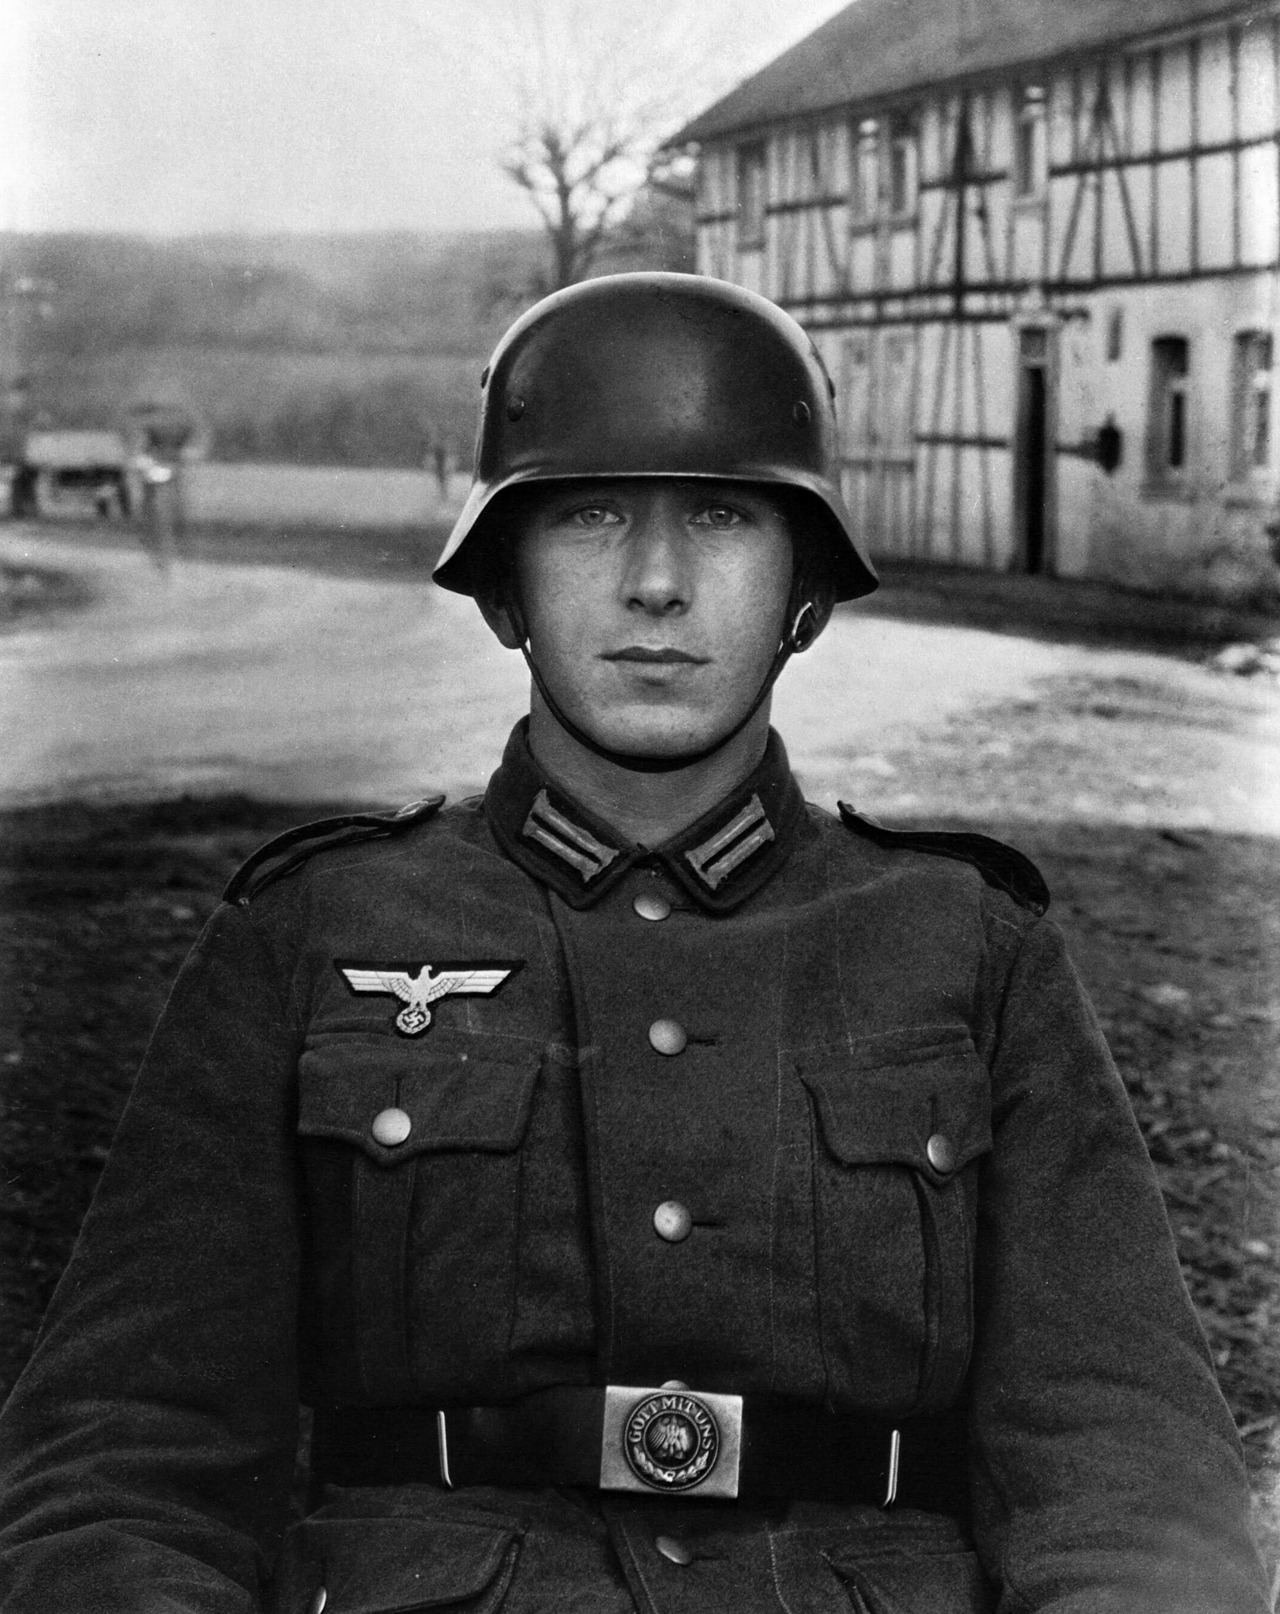 August Sander, Giovane soldato, Westerwald, 1945